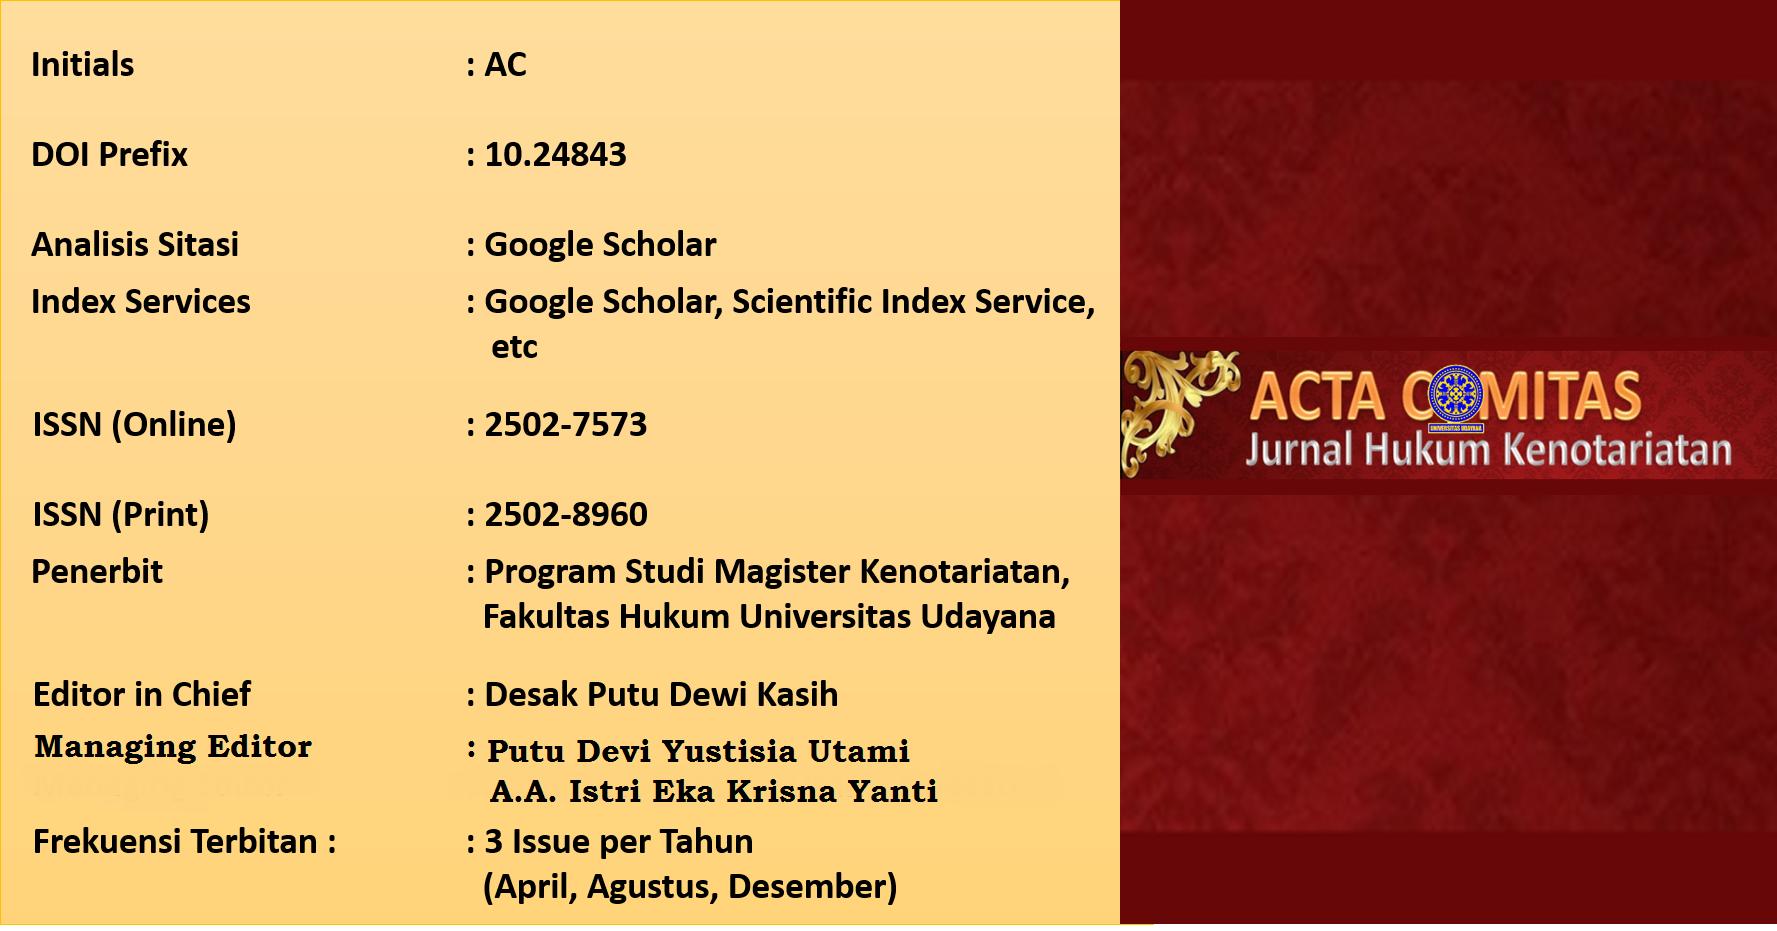 Acta Comitas Jurnal Hukum Kenotariatan